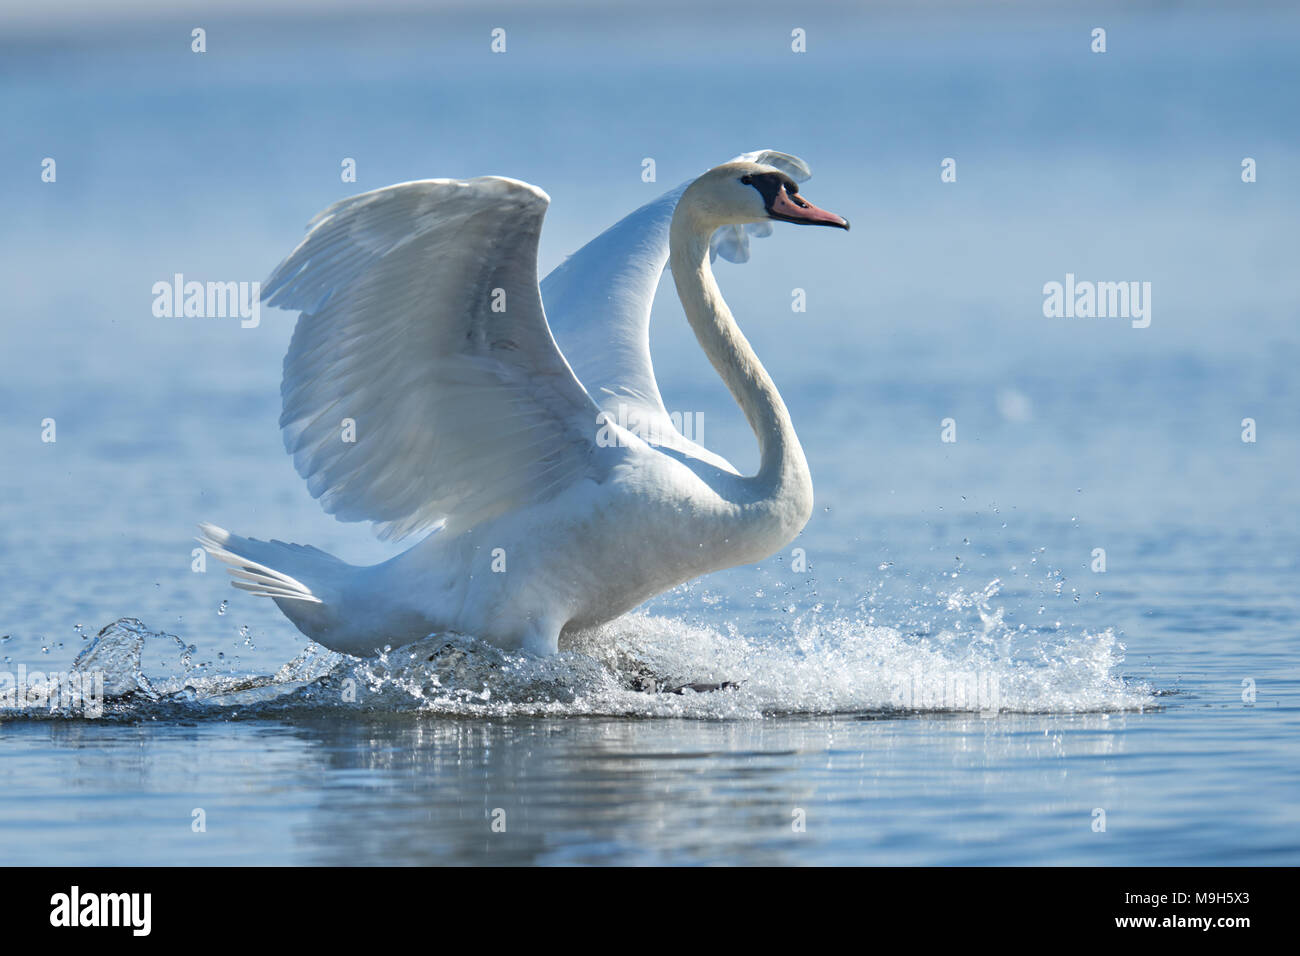 Swan rising from water and splashing water drops around - Stock Image